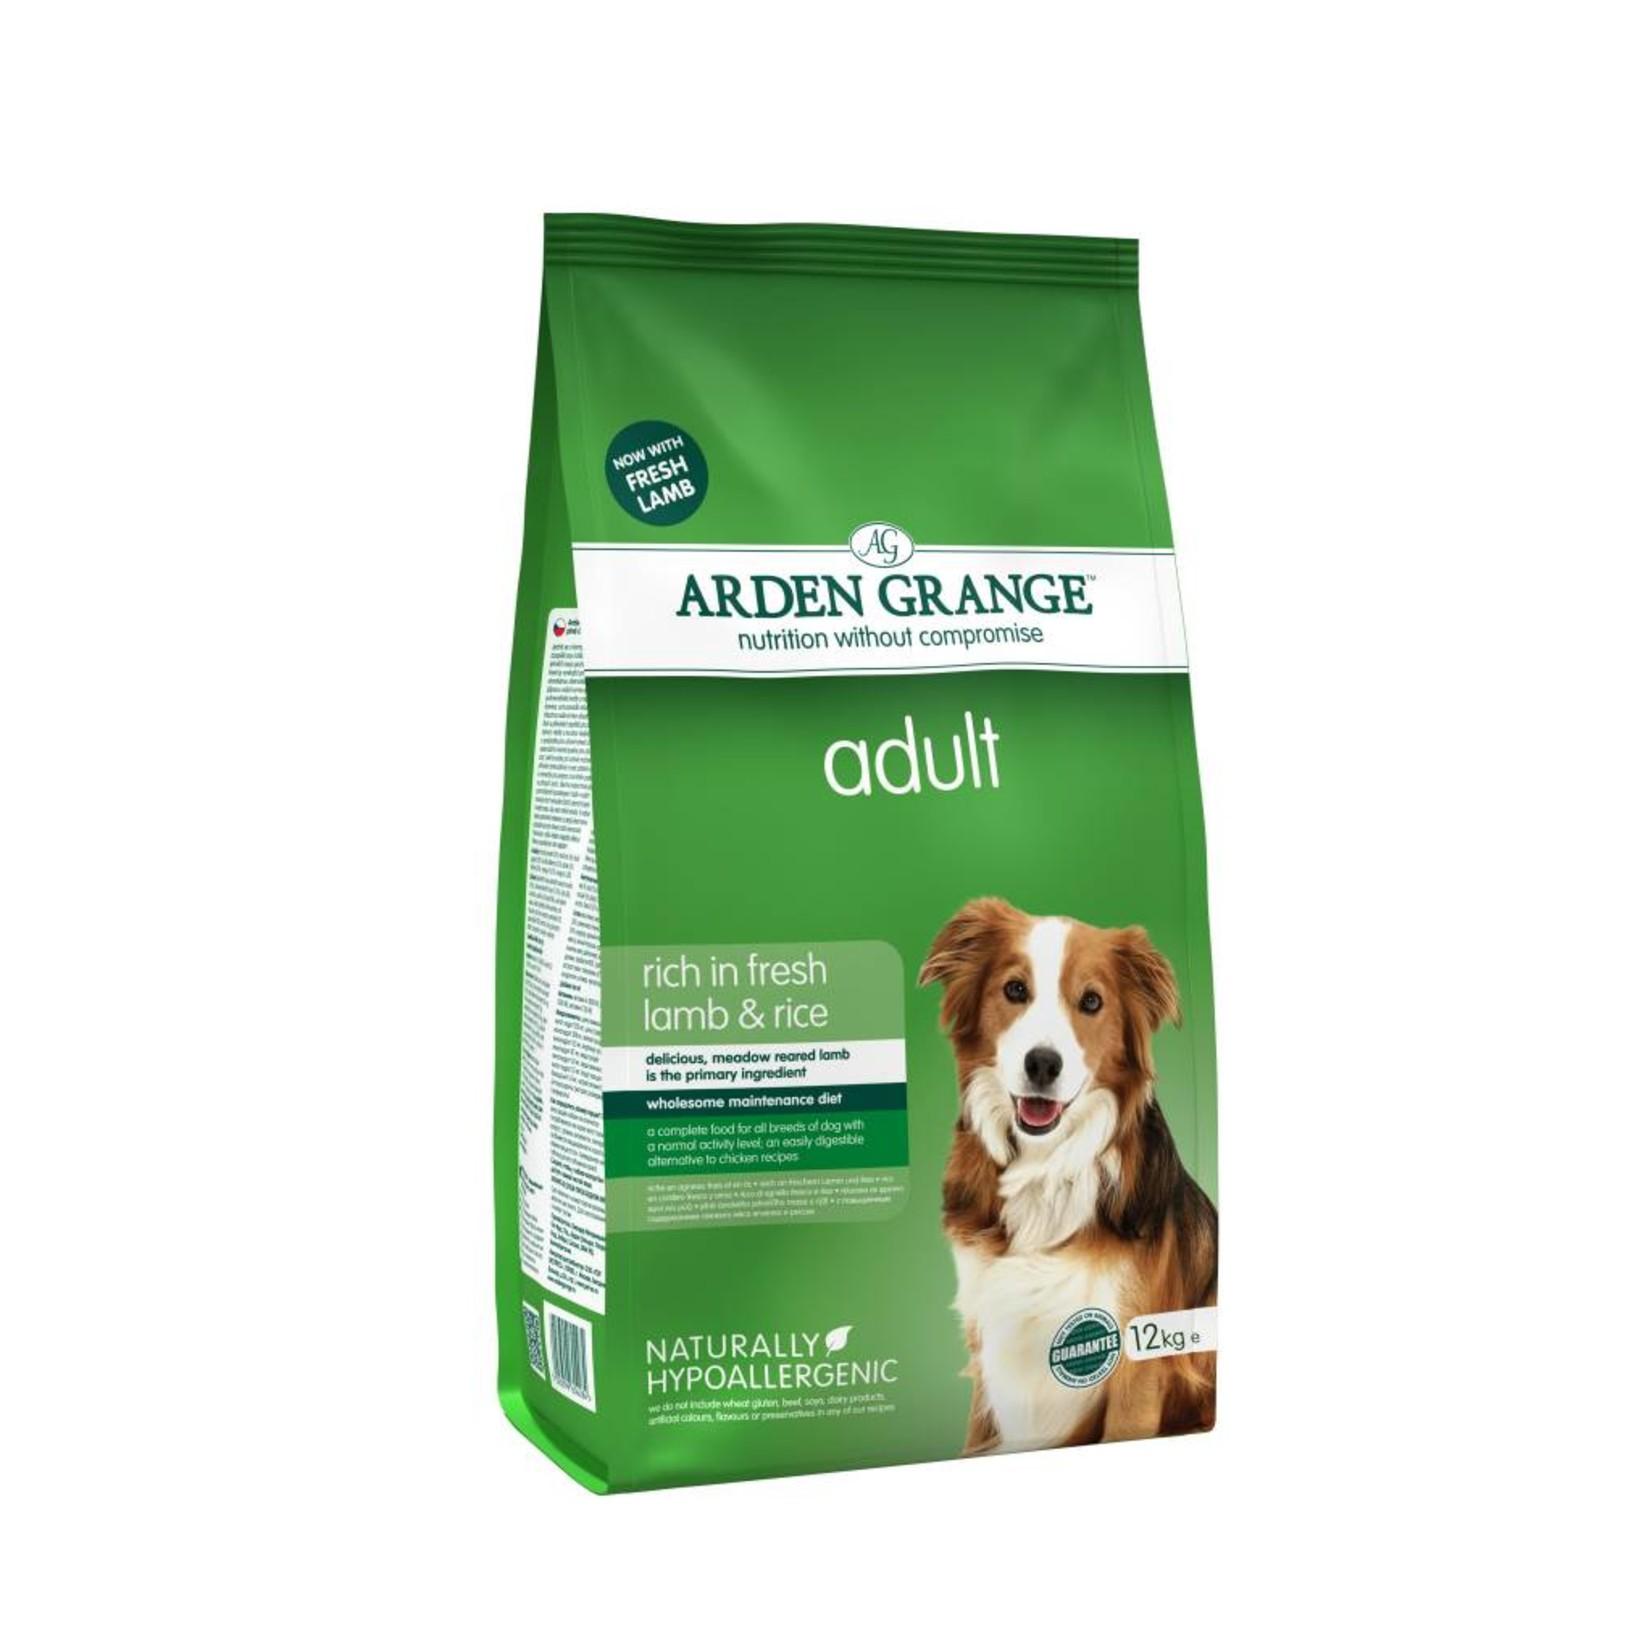 Arden Grange Adult Dog Dry Food, Lamb & Rice